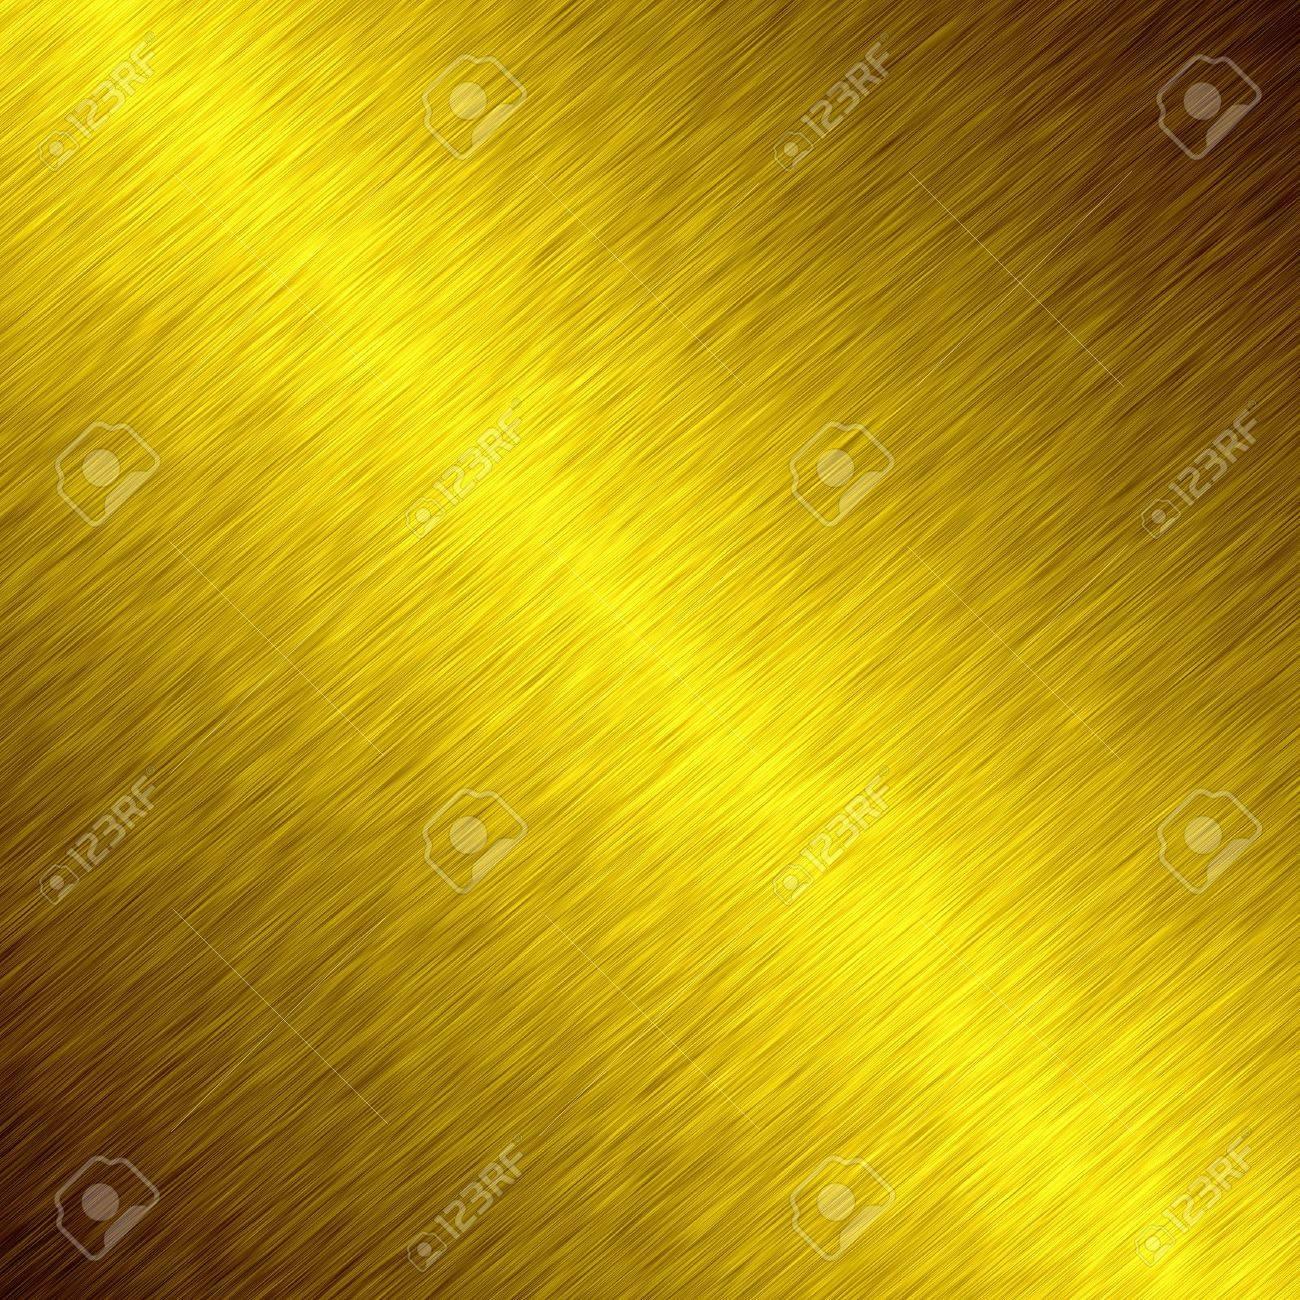 gold metal Stock Photo - 12043421